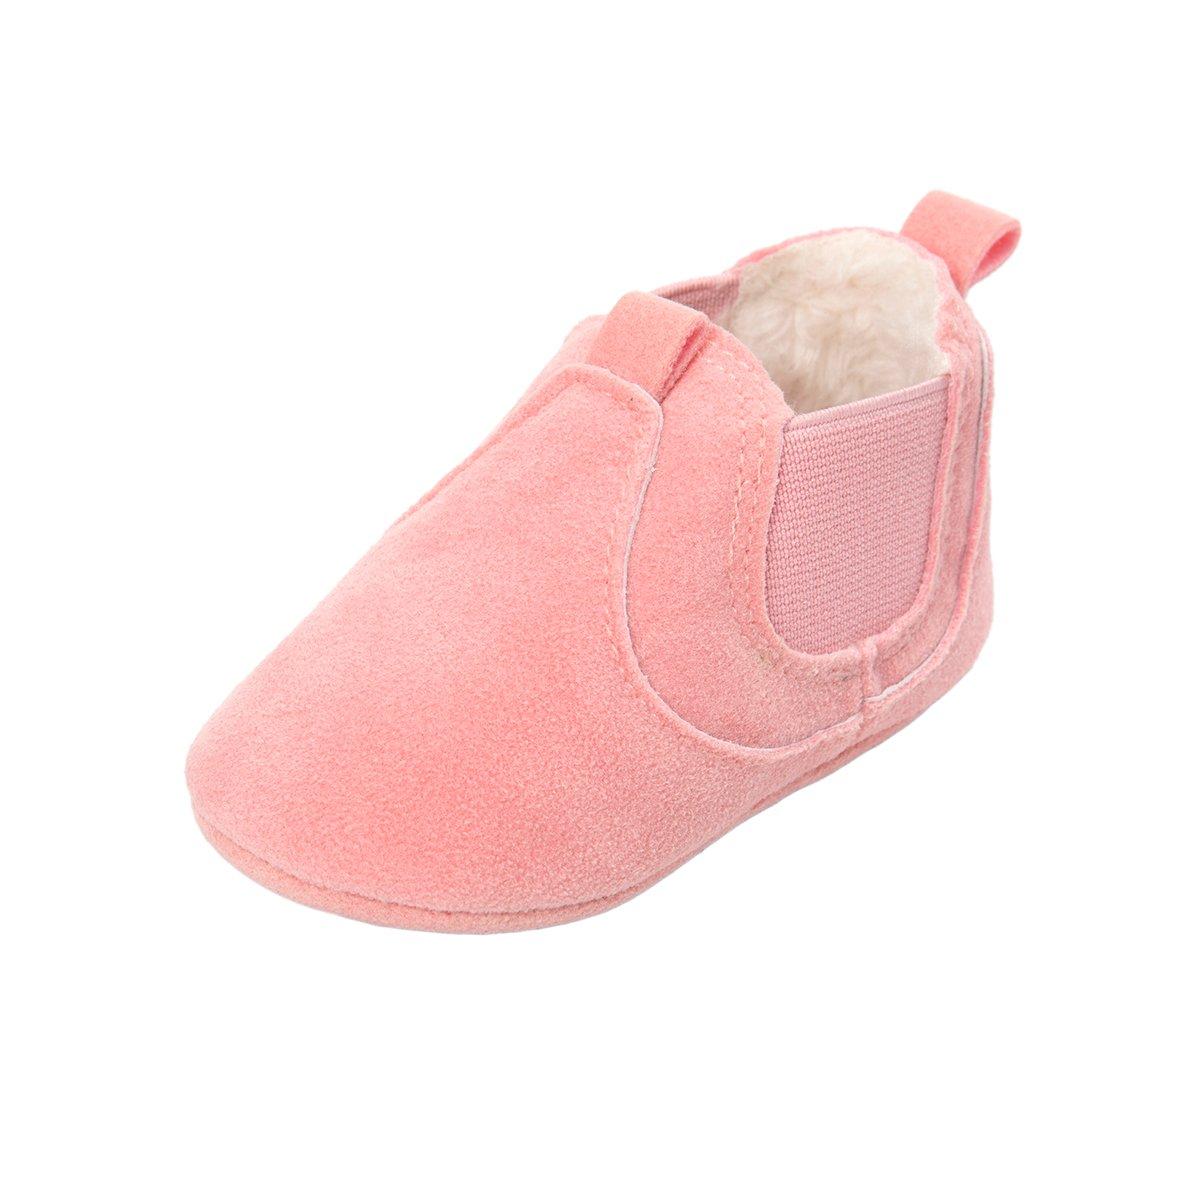 ESTAMICO Baby Boys Girls Warm Casual Winter Sneakers Prewalker Shoes